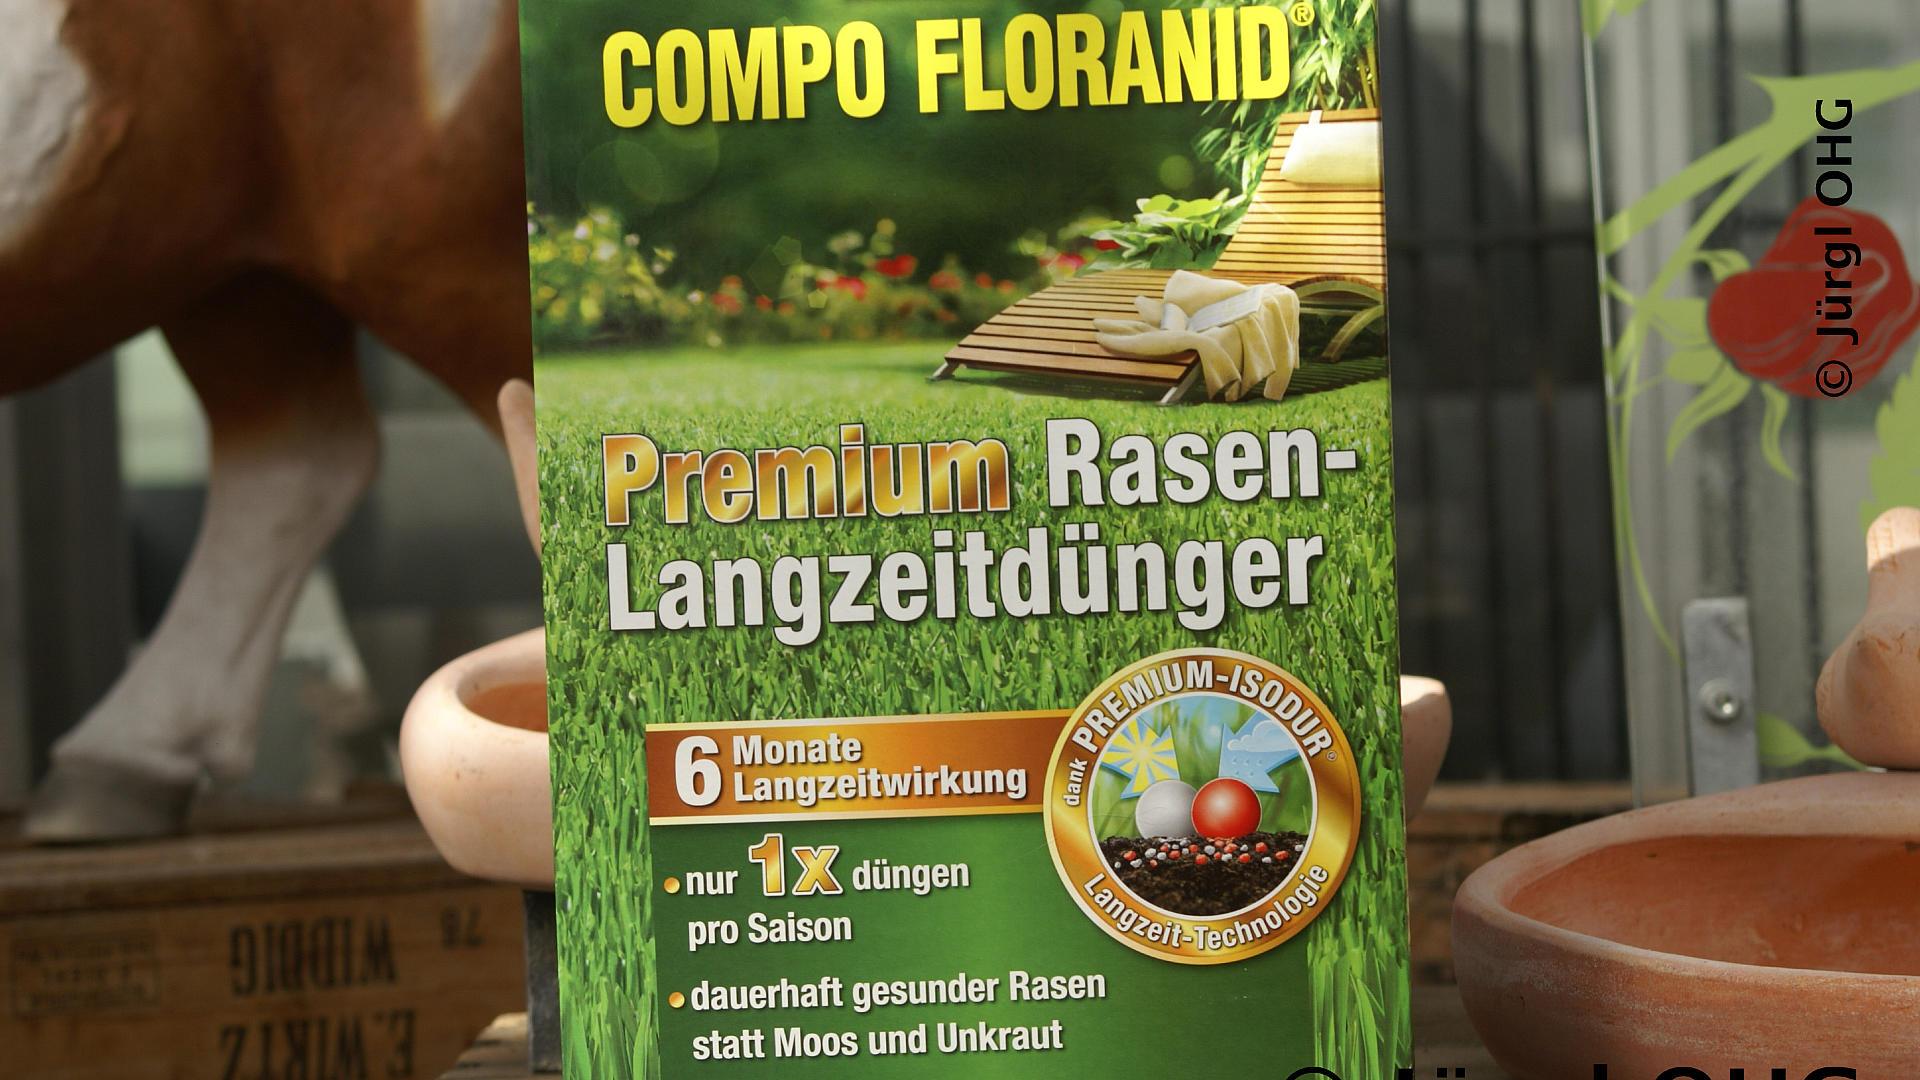 compo floranid premium rasen langzeitd nger. Black Bedroom Furniture Sets. Home Design Ideas